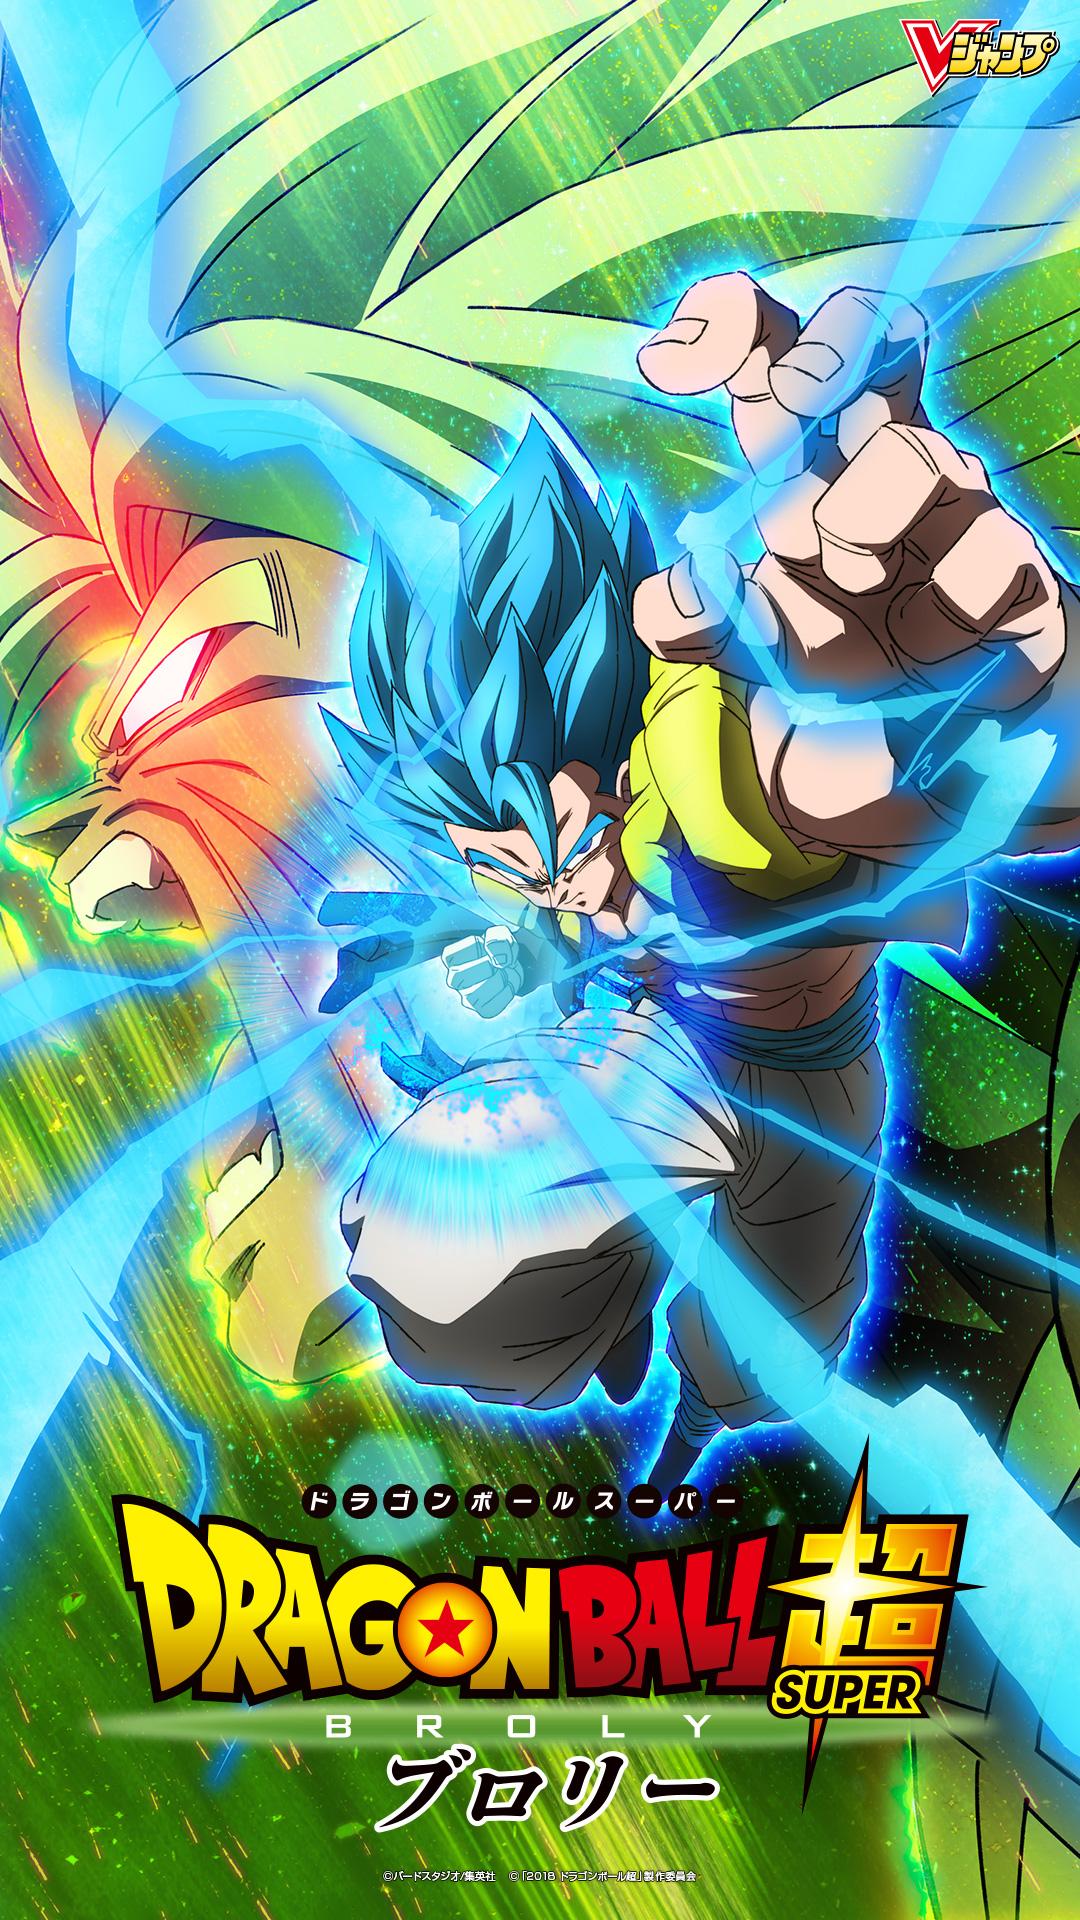 Free Download Dragon Ball Super Broly Mobile Wallpaper 2455463